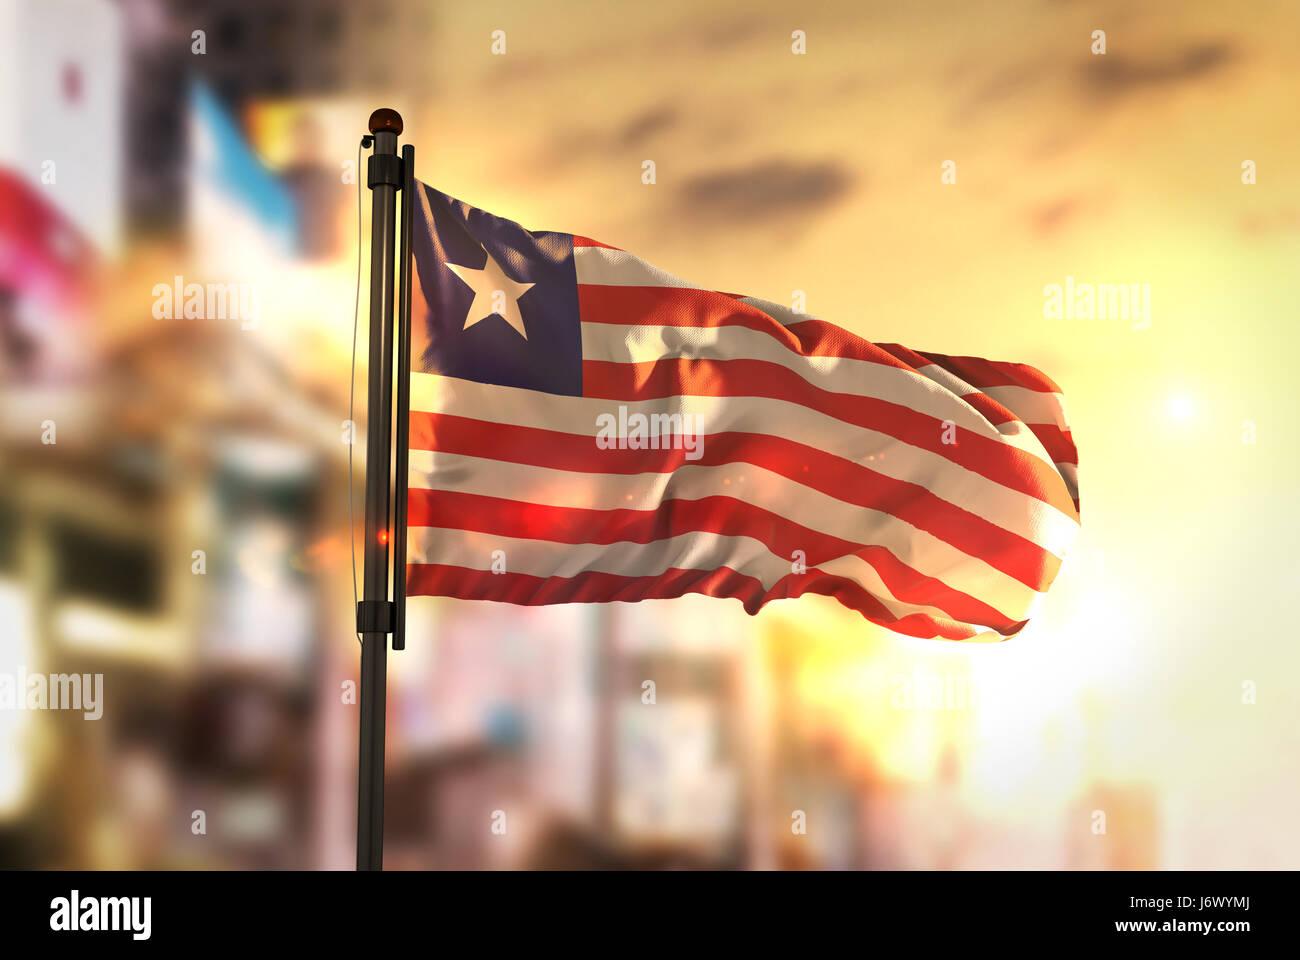 Liberia Flag Against City Blurred Background At Sunrise Backlight - Stock Image